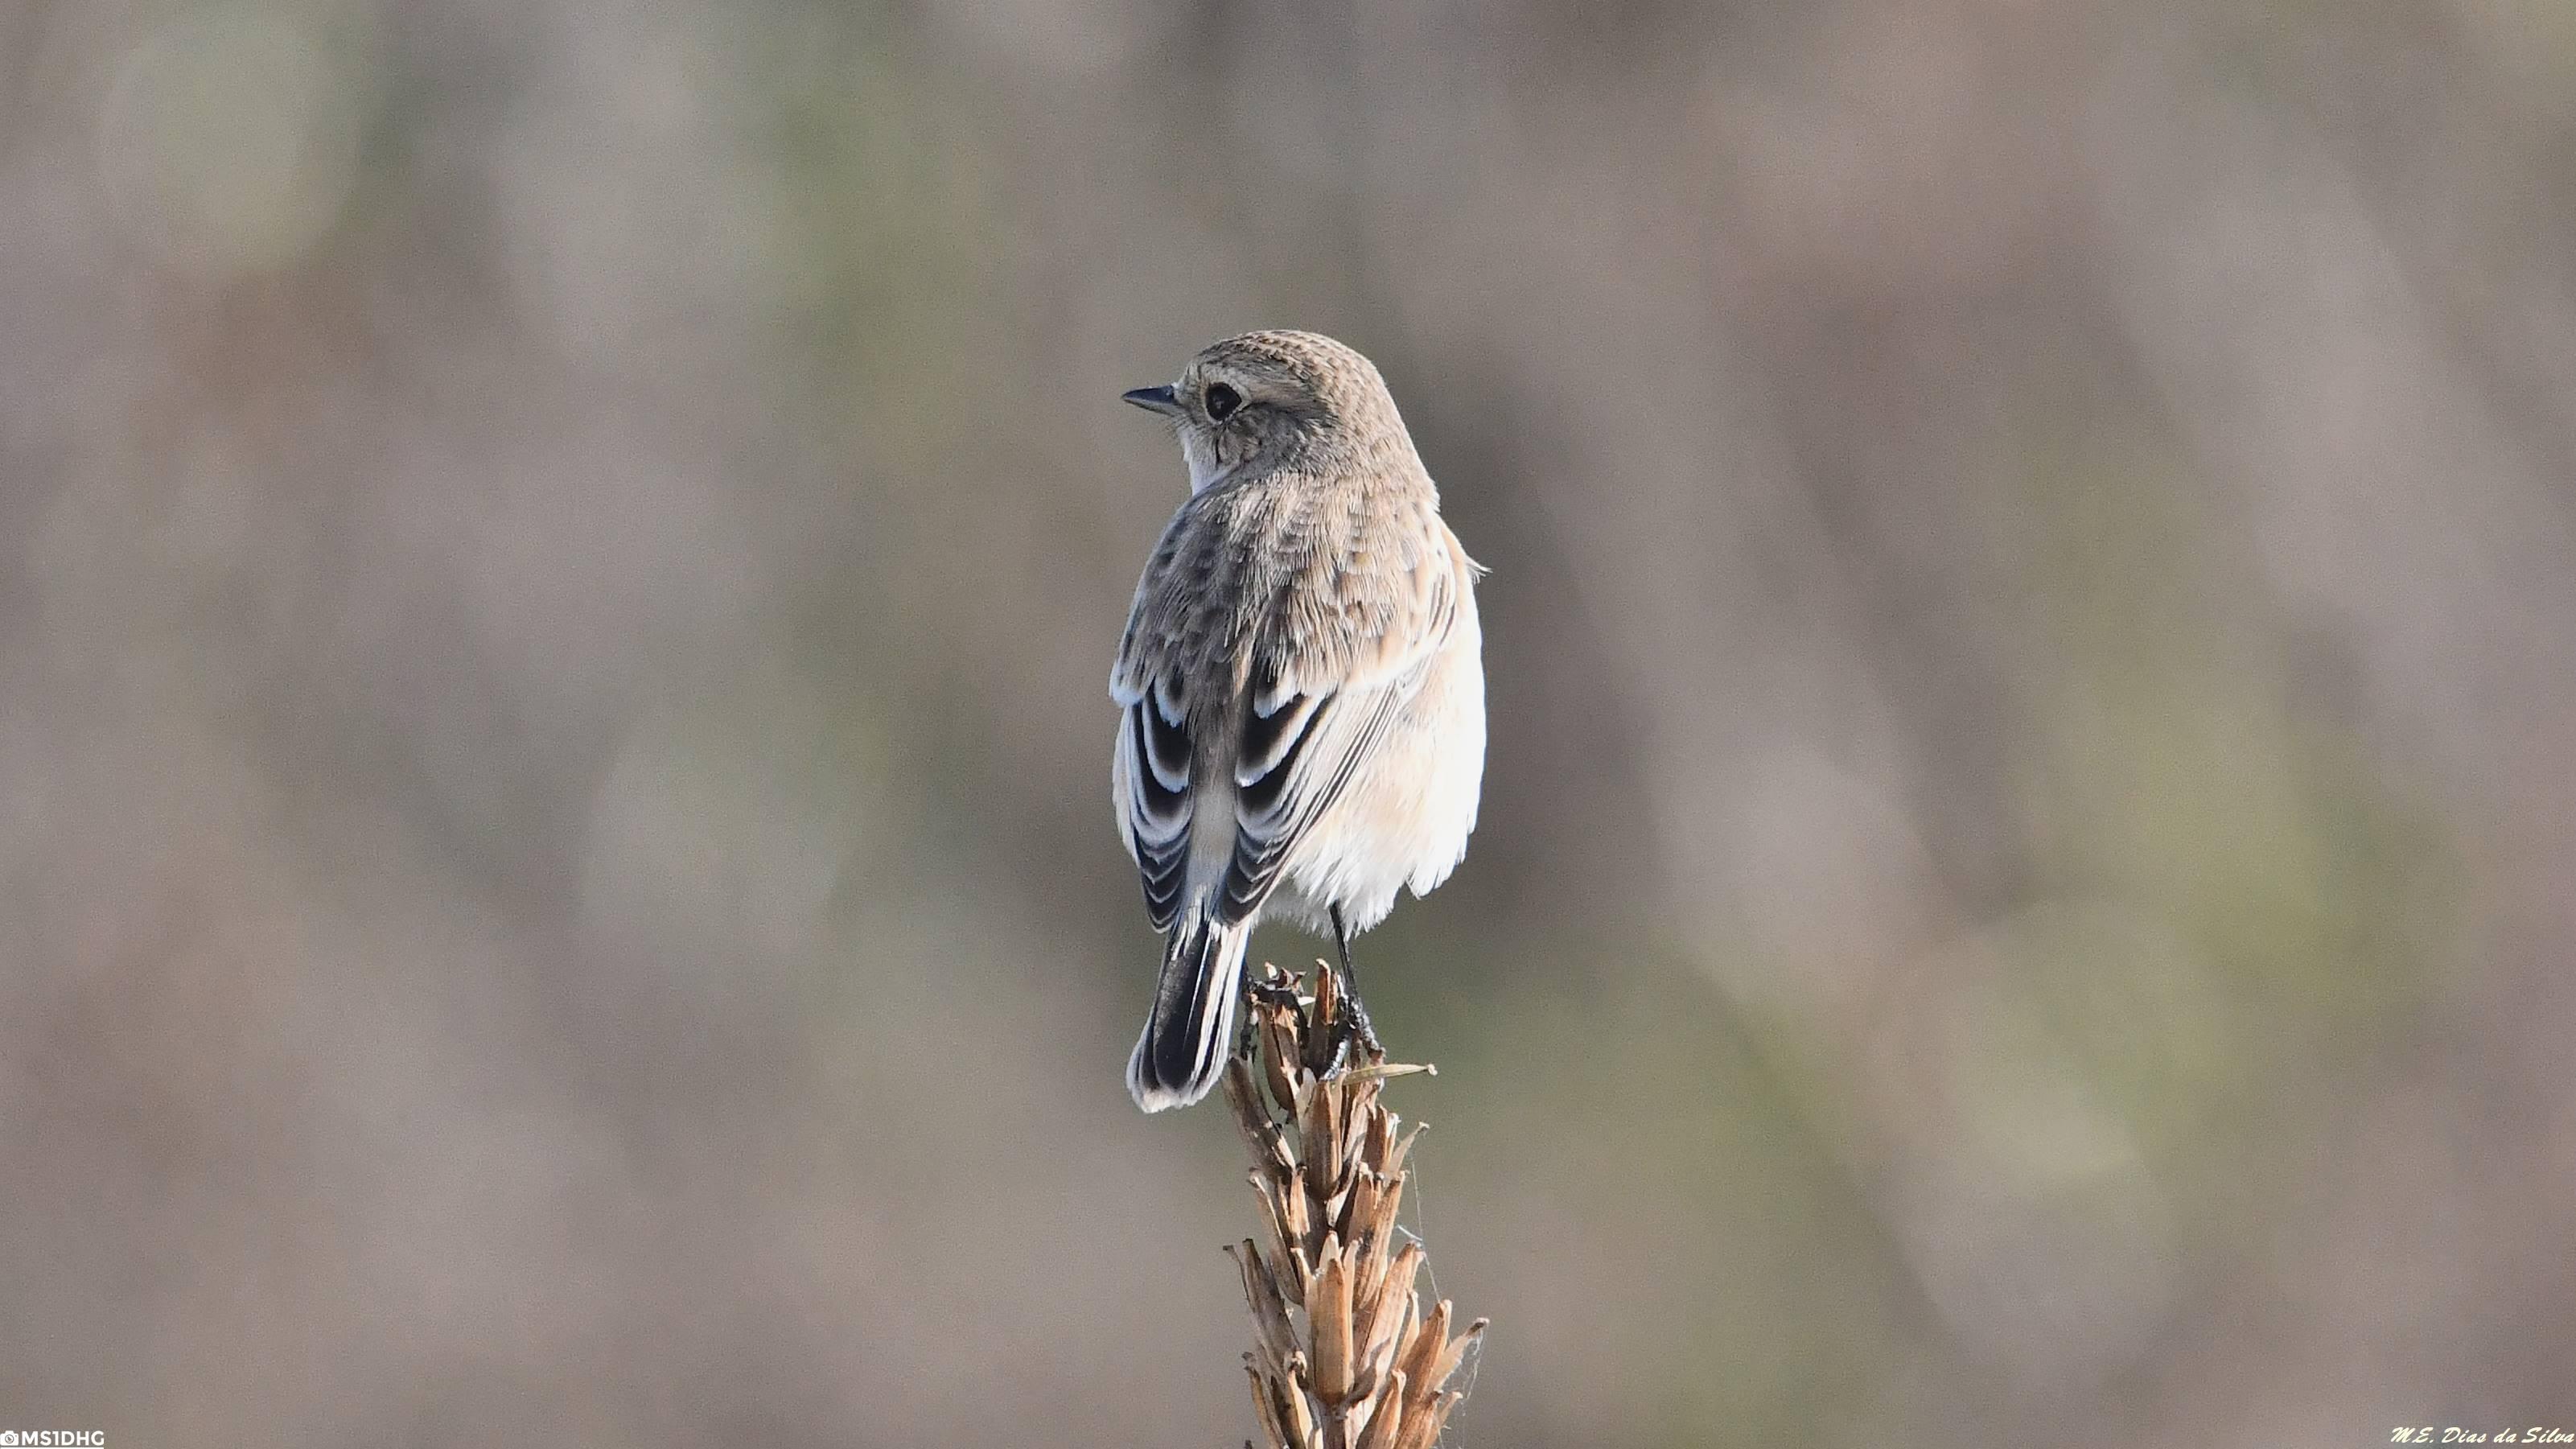 Fórum Aves - Birdwatching em Portugal - Portal Cartaxo%20siberiano%20(4)